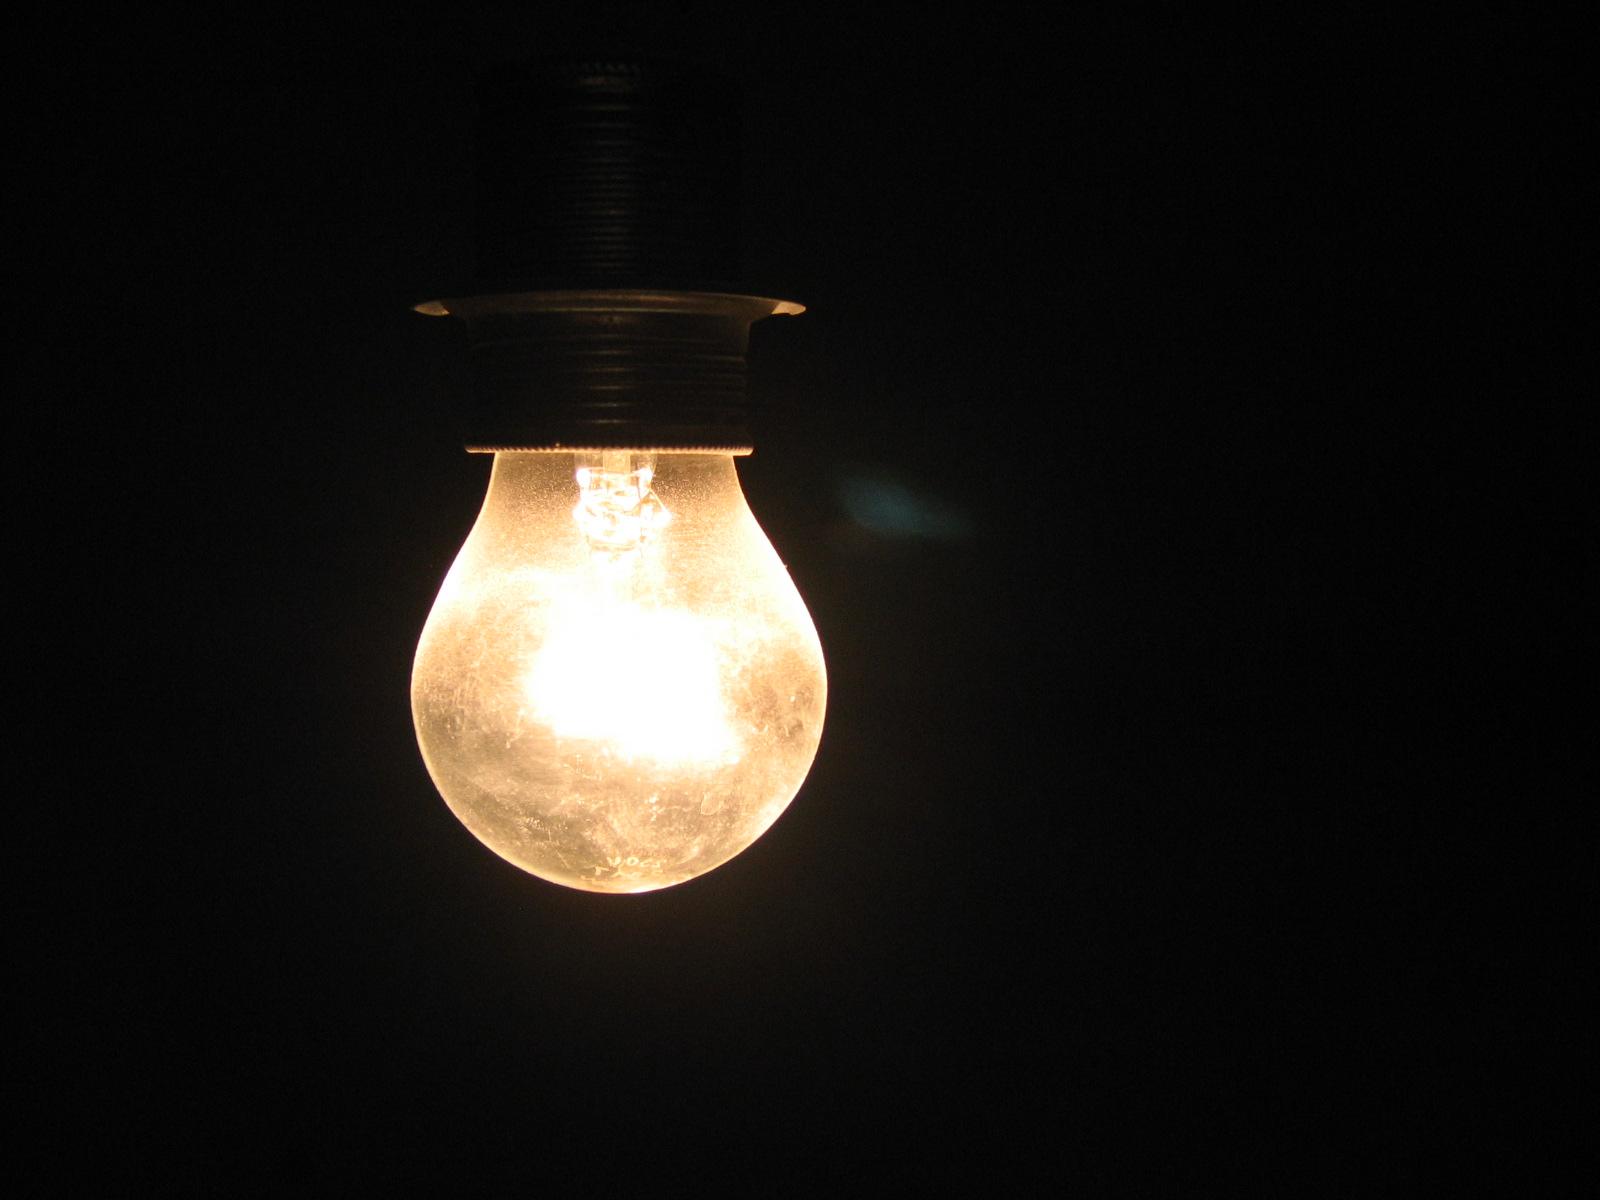 wz_bring_the_light_back_5326246430-803730.jpeg